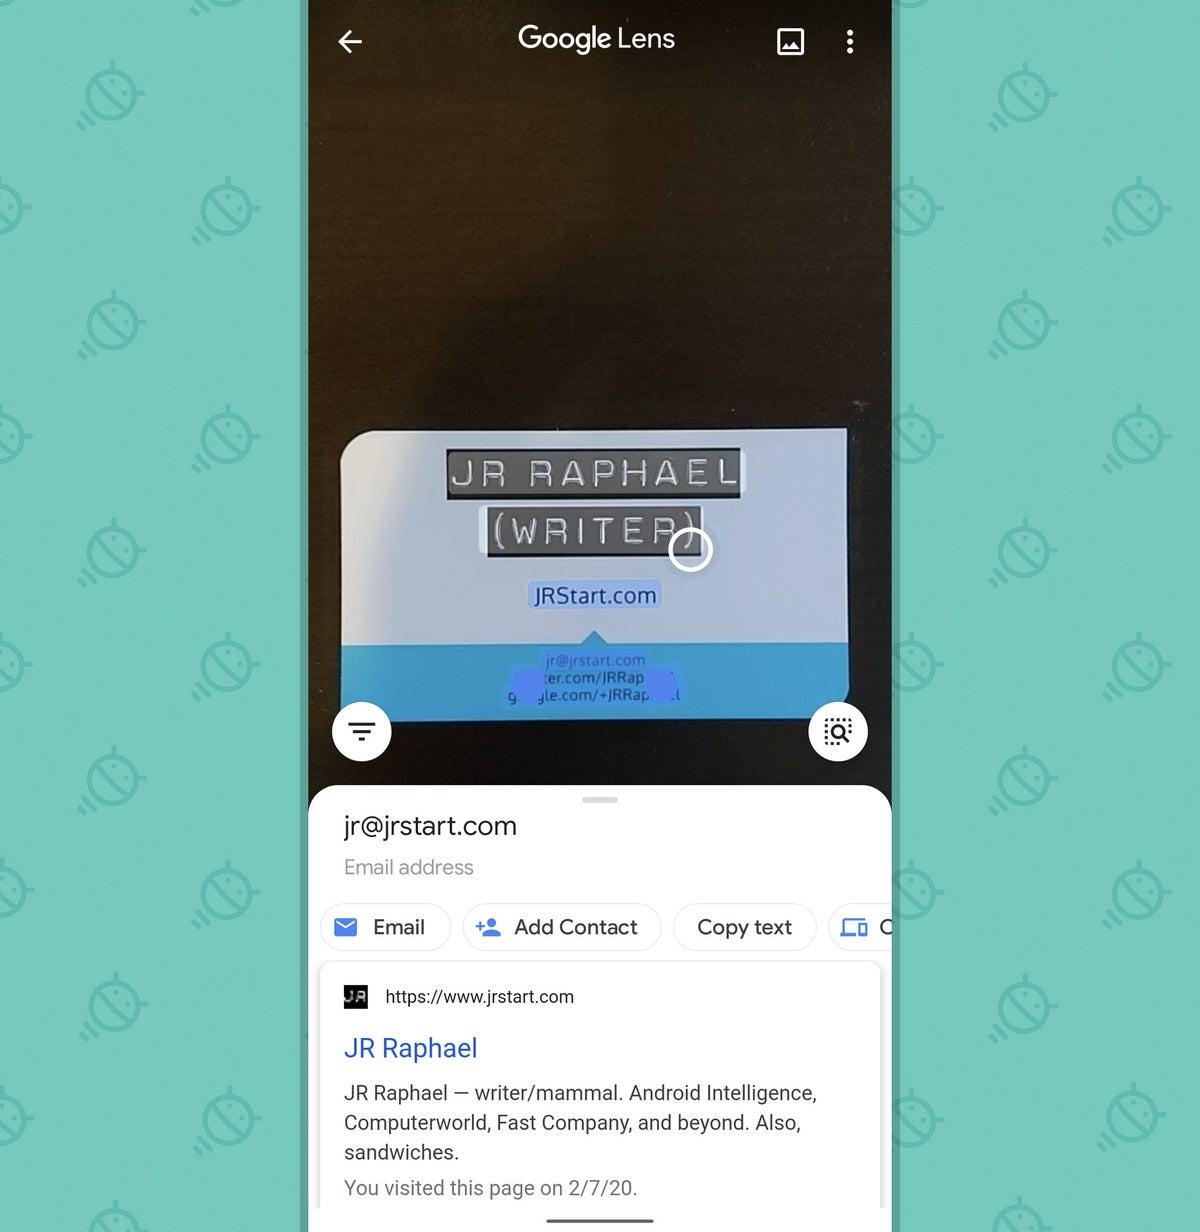 Google Lens App: Send email